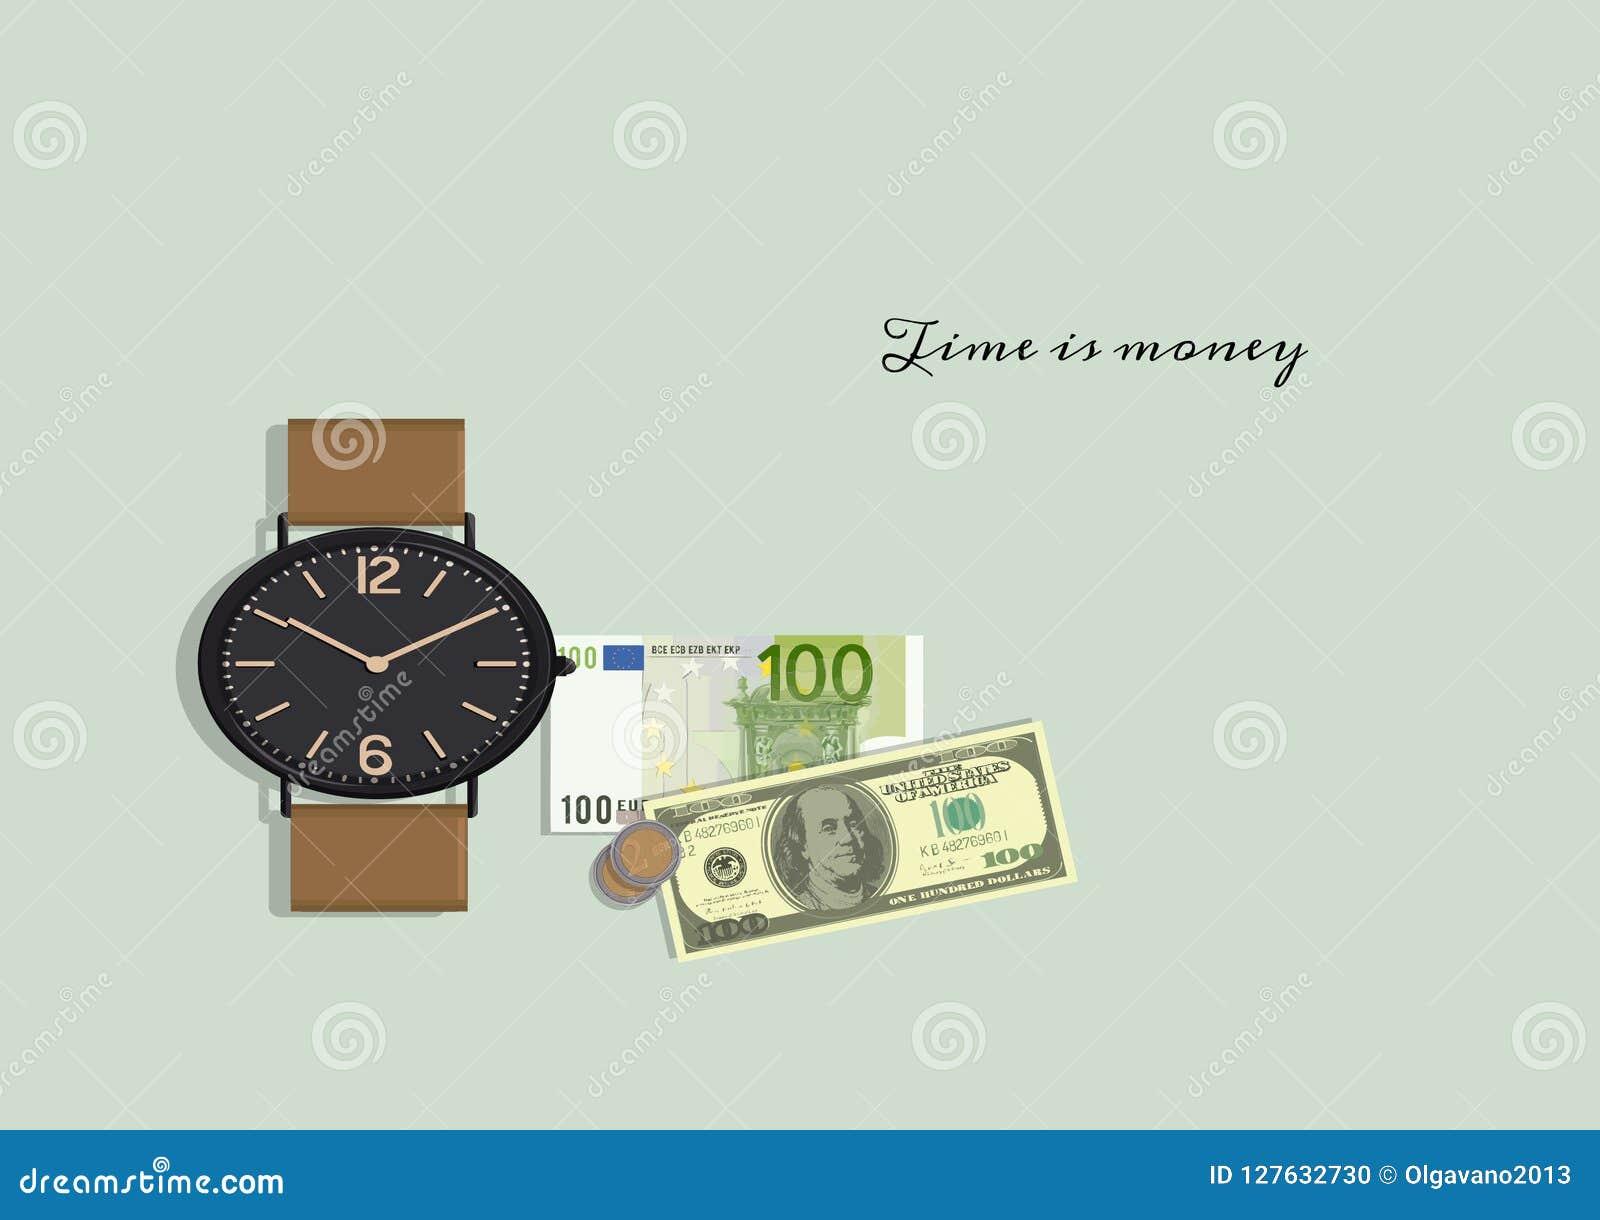 Time is money phrase author Benjamin Franklin